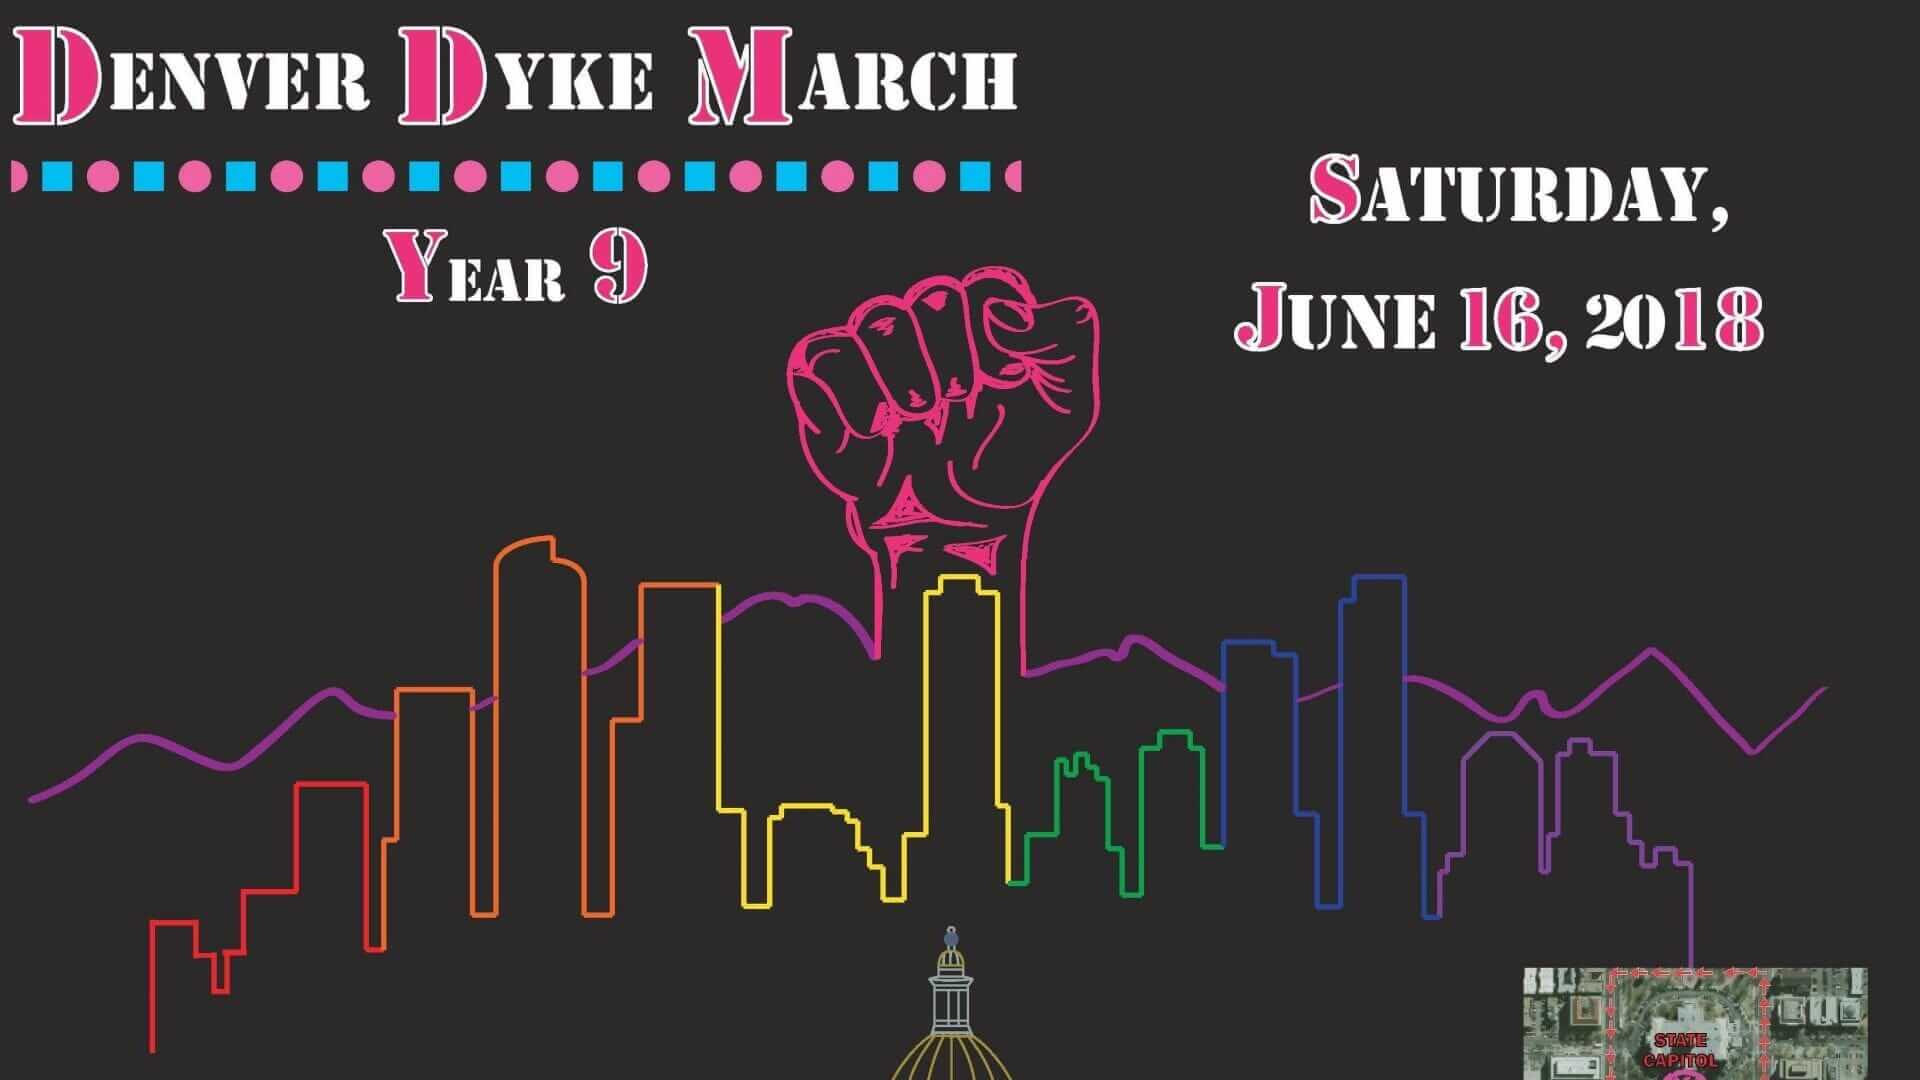 Denver Dyke March 2018